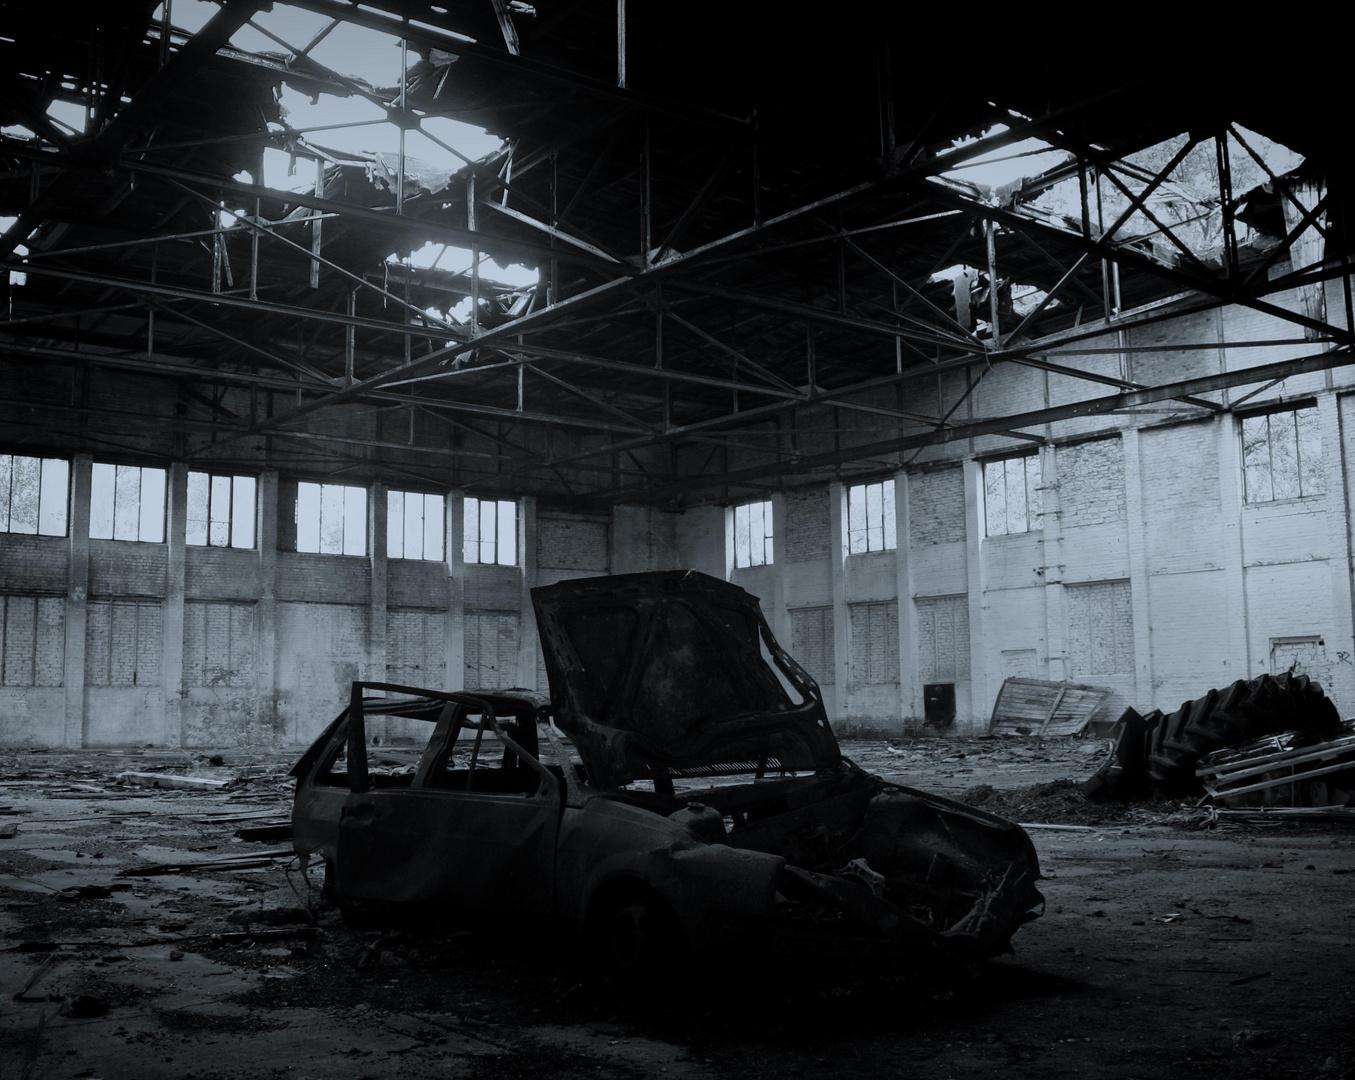 VW Polo im Hangar